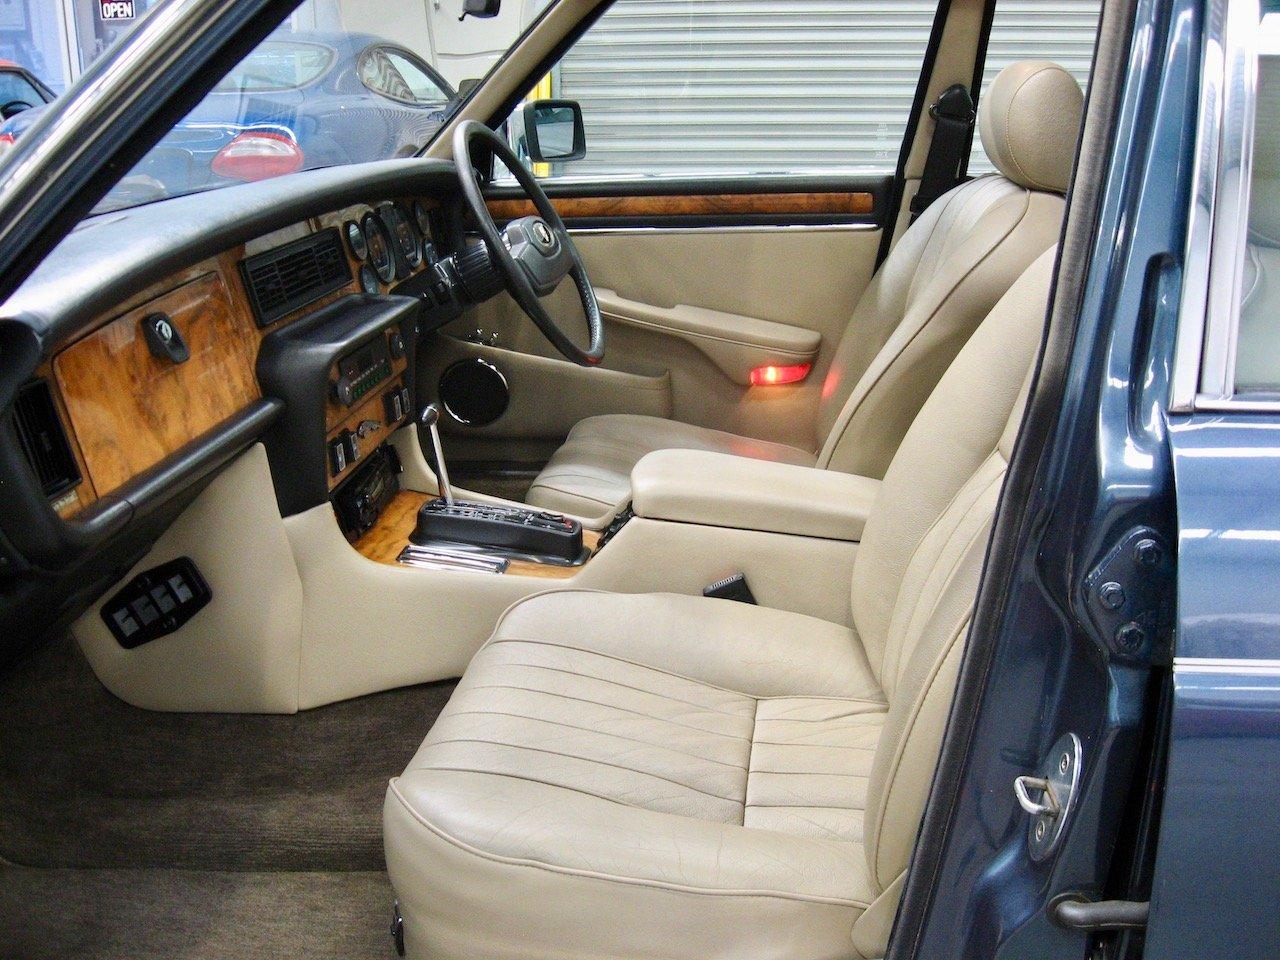 1987 Jaguar XJ12 Series 3 Sovereign V12 For Sale (picture 5 of 6)